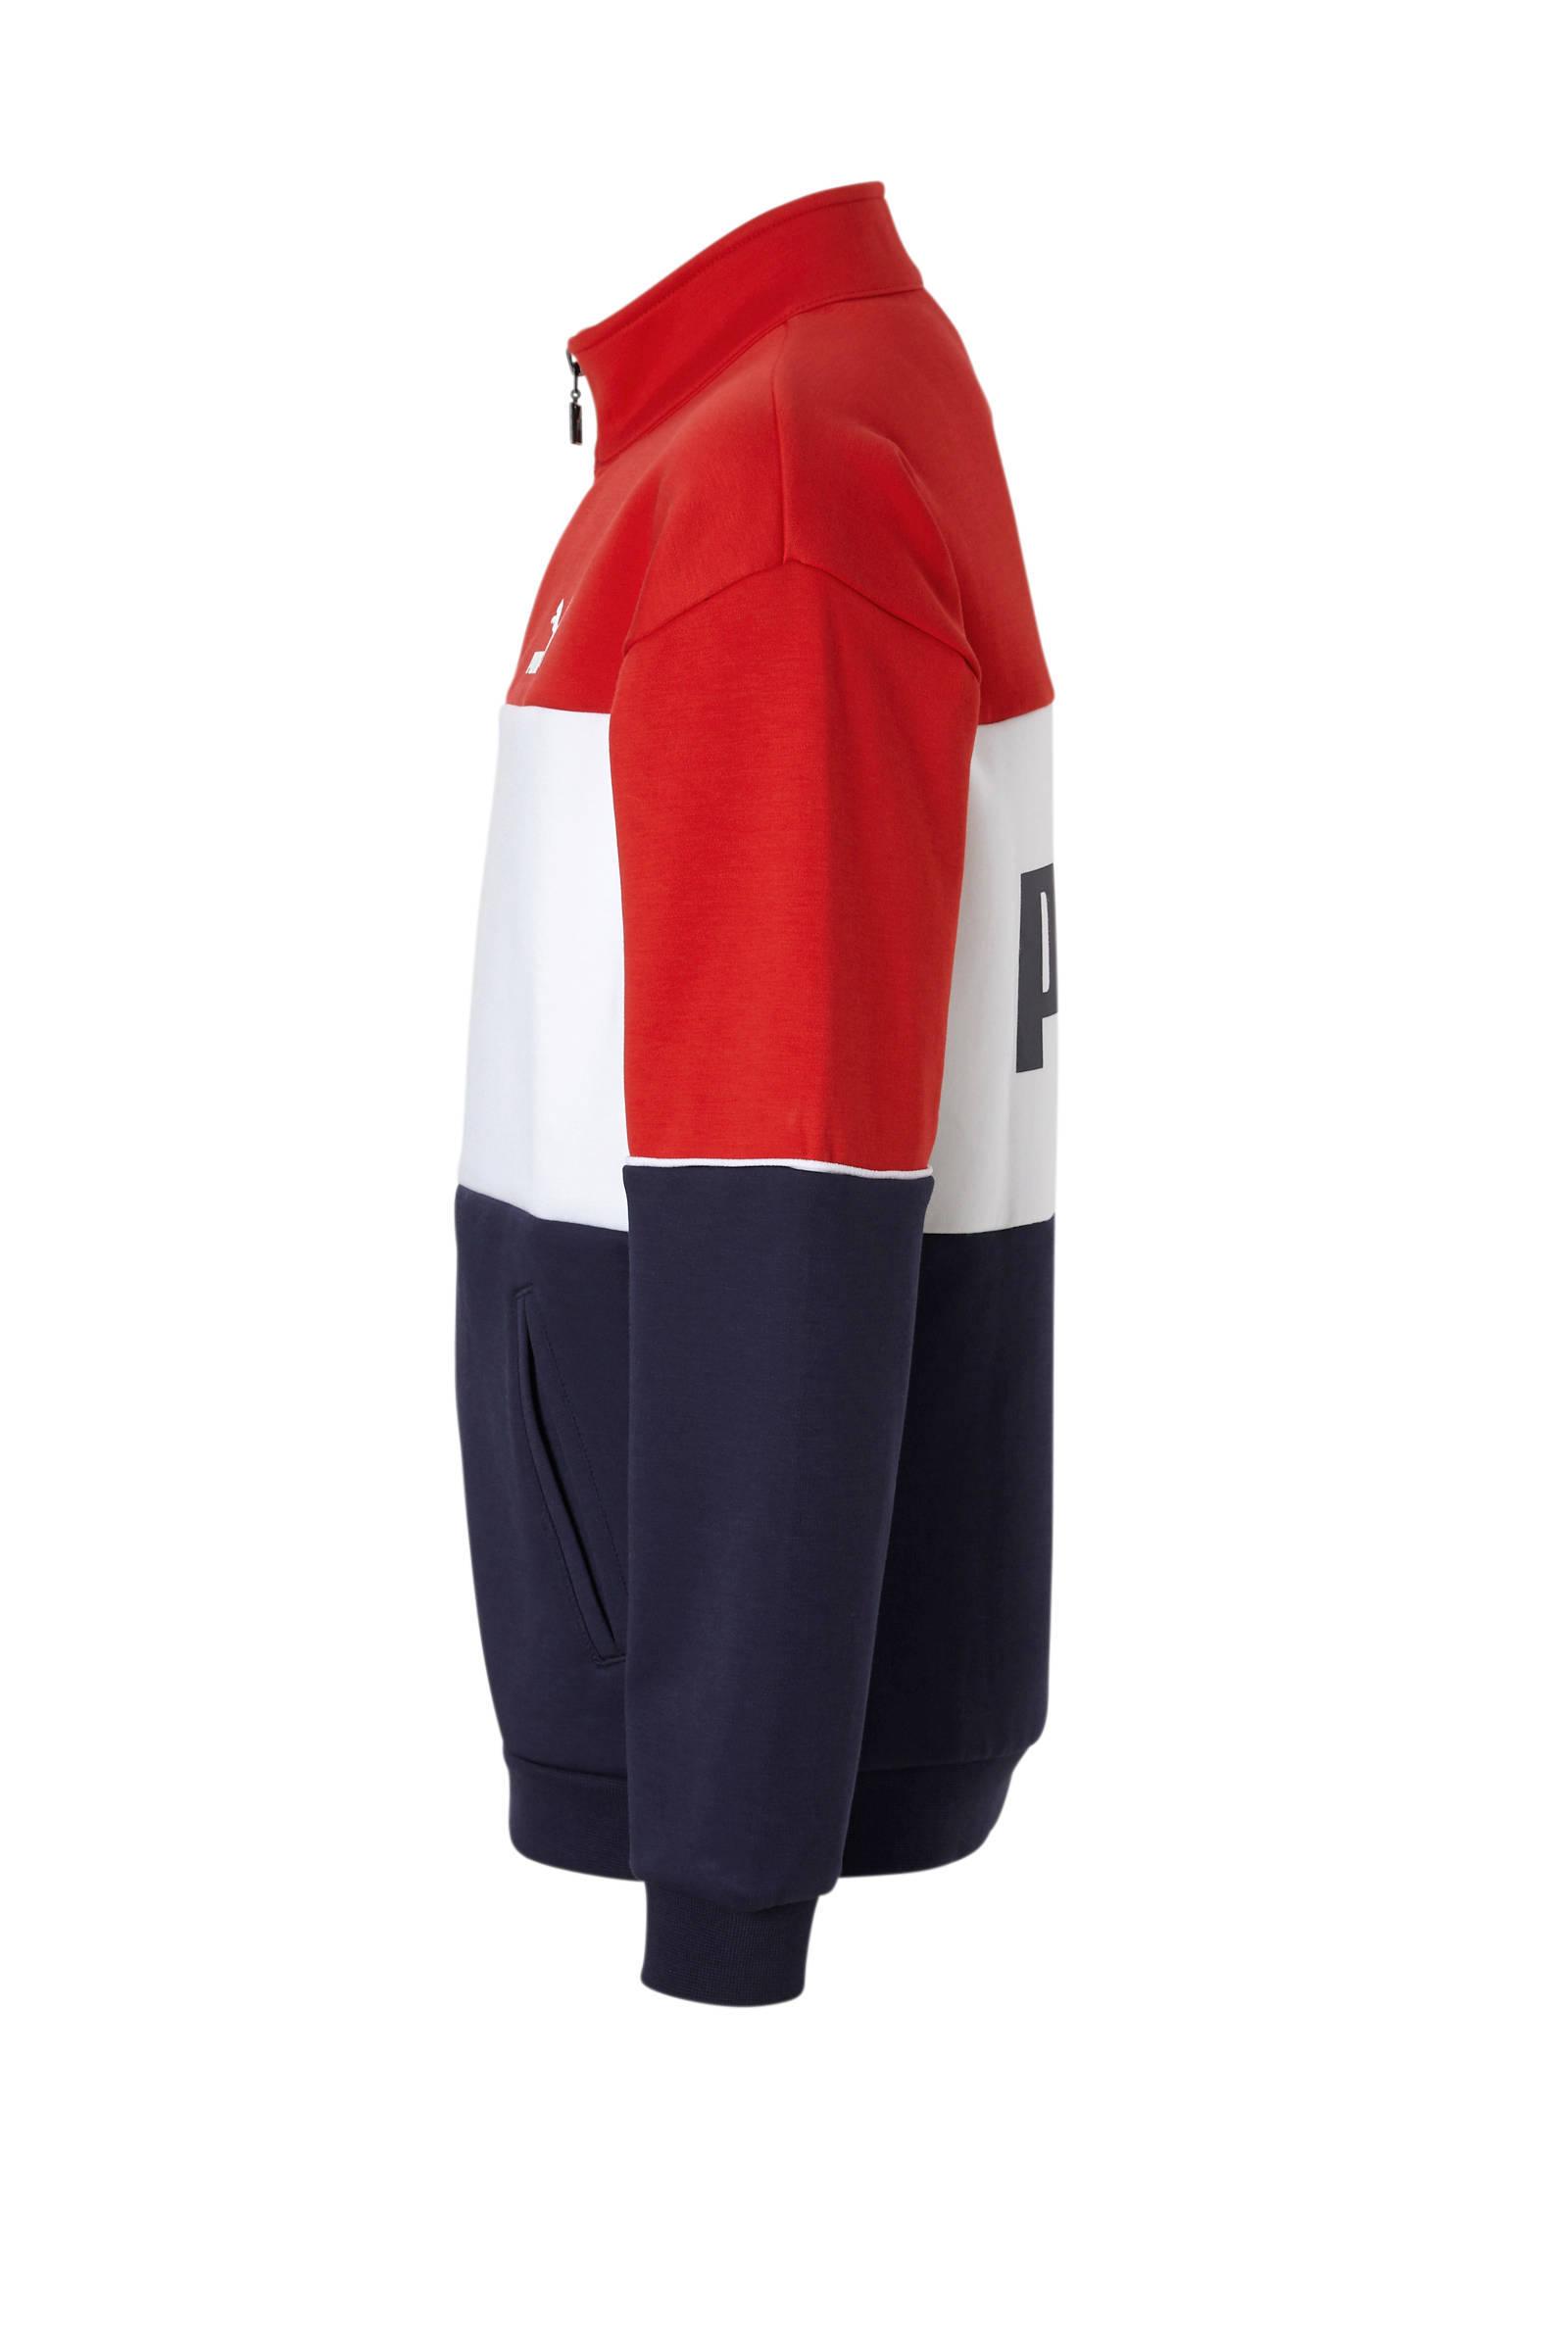 Puma Retro Jkt B sweatvest roodwitblauw | Adidas jacket